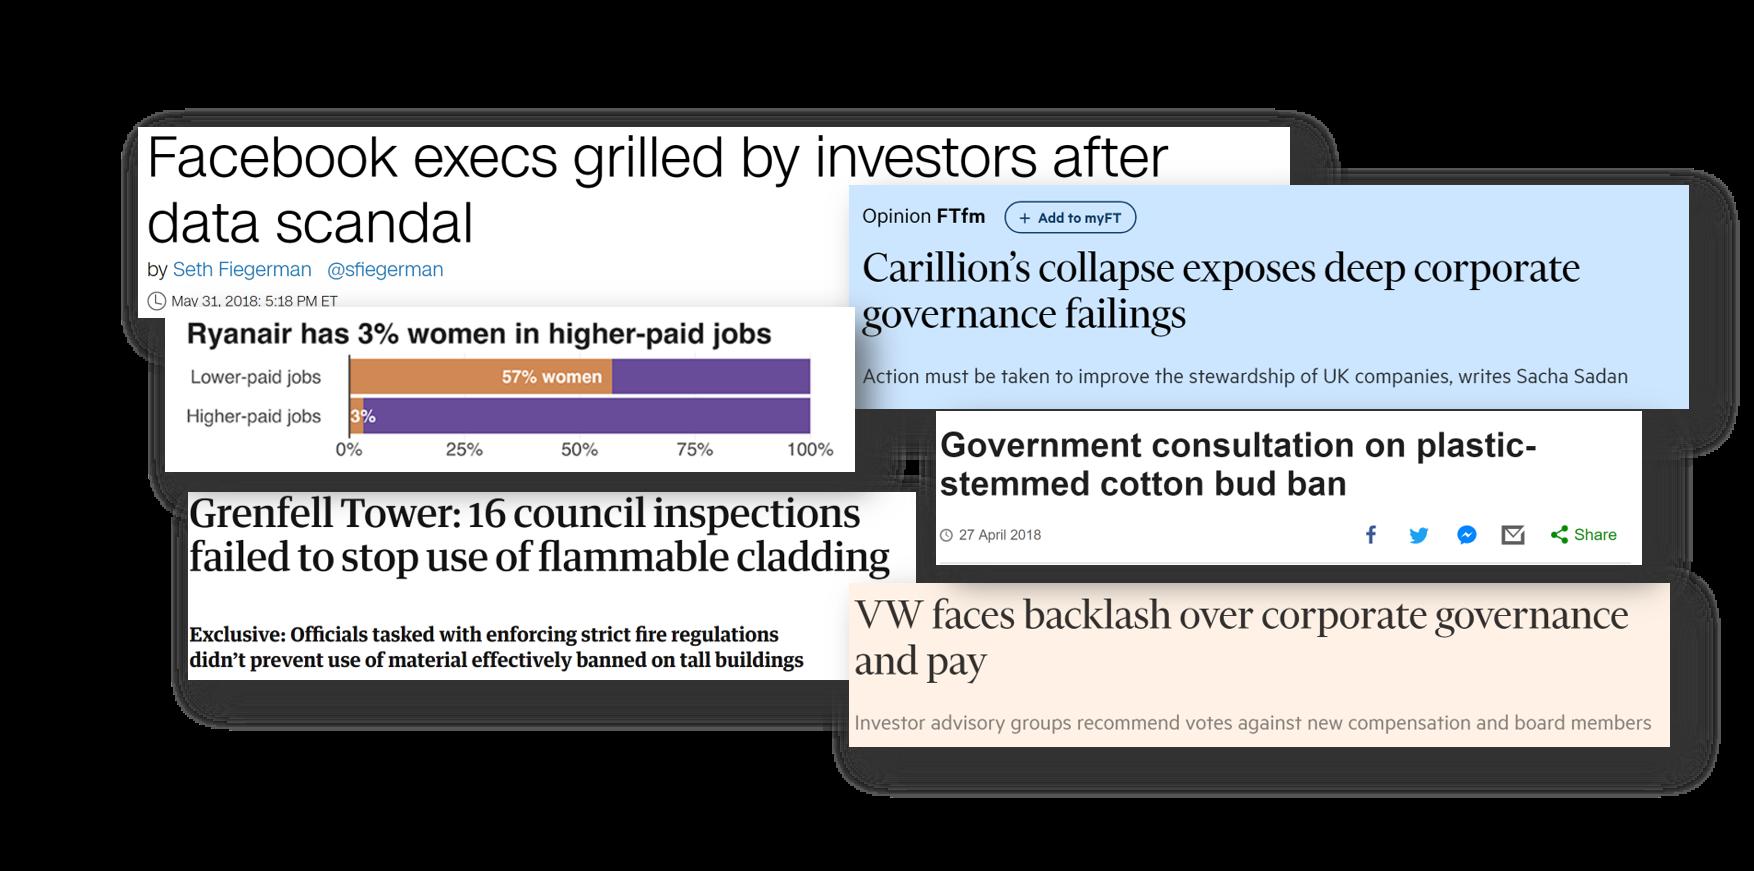 Governance failures